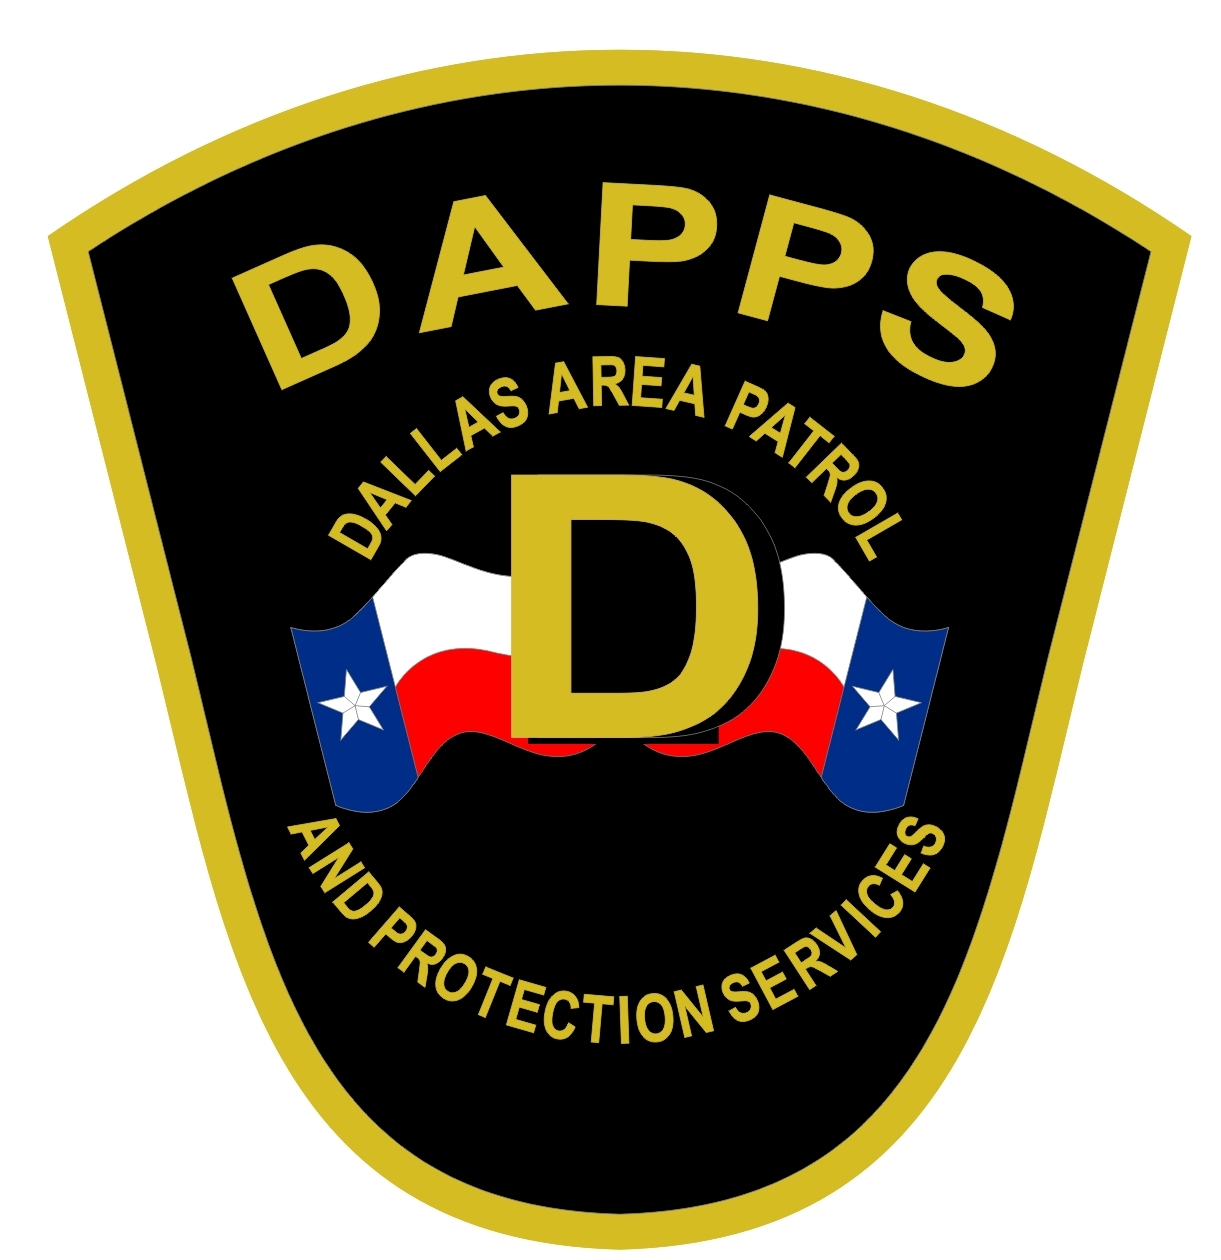 DAPPS Co LOGO &  Emblem